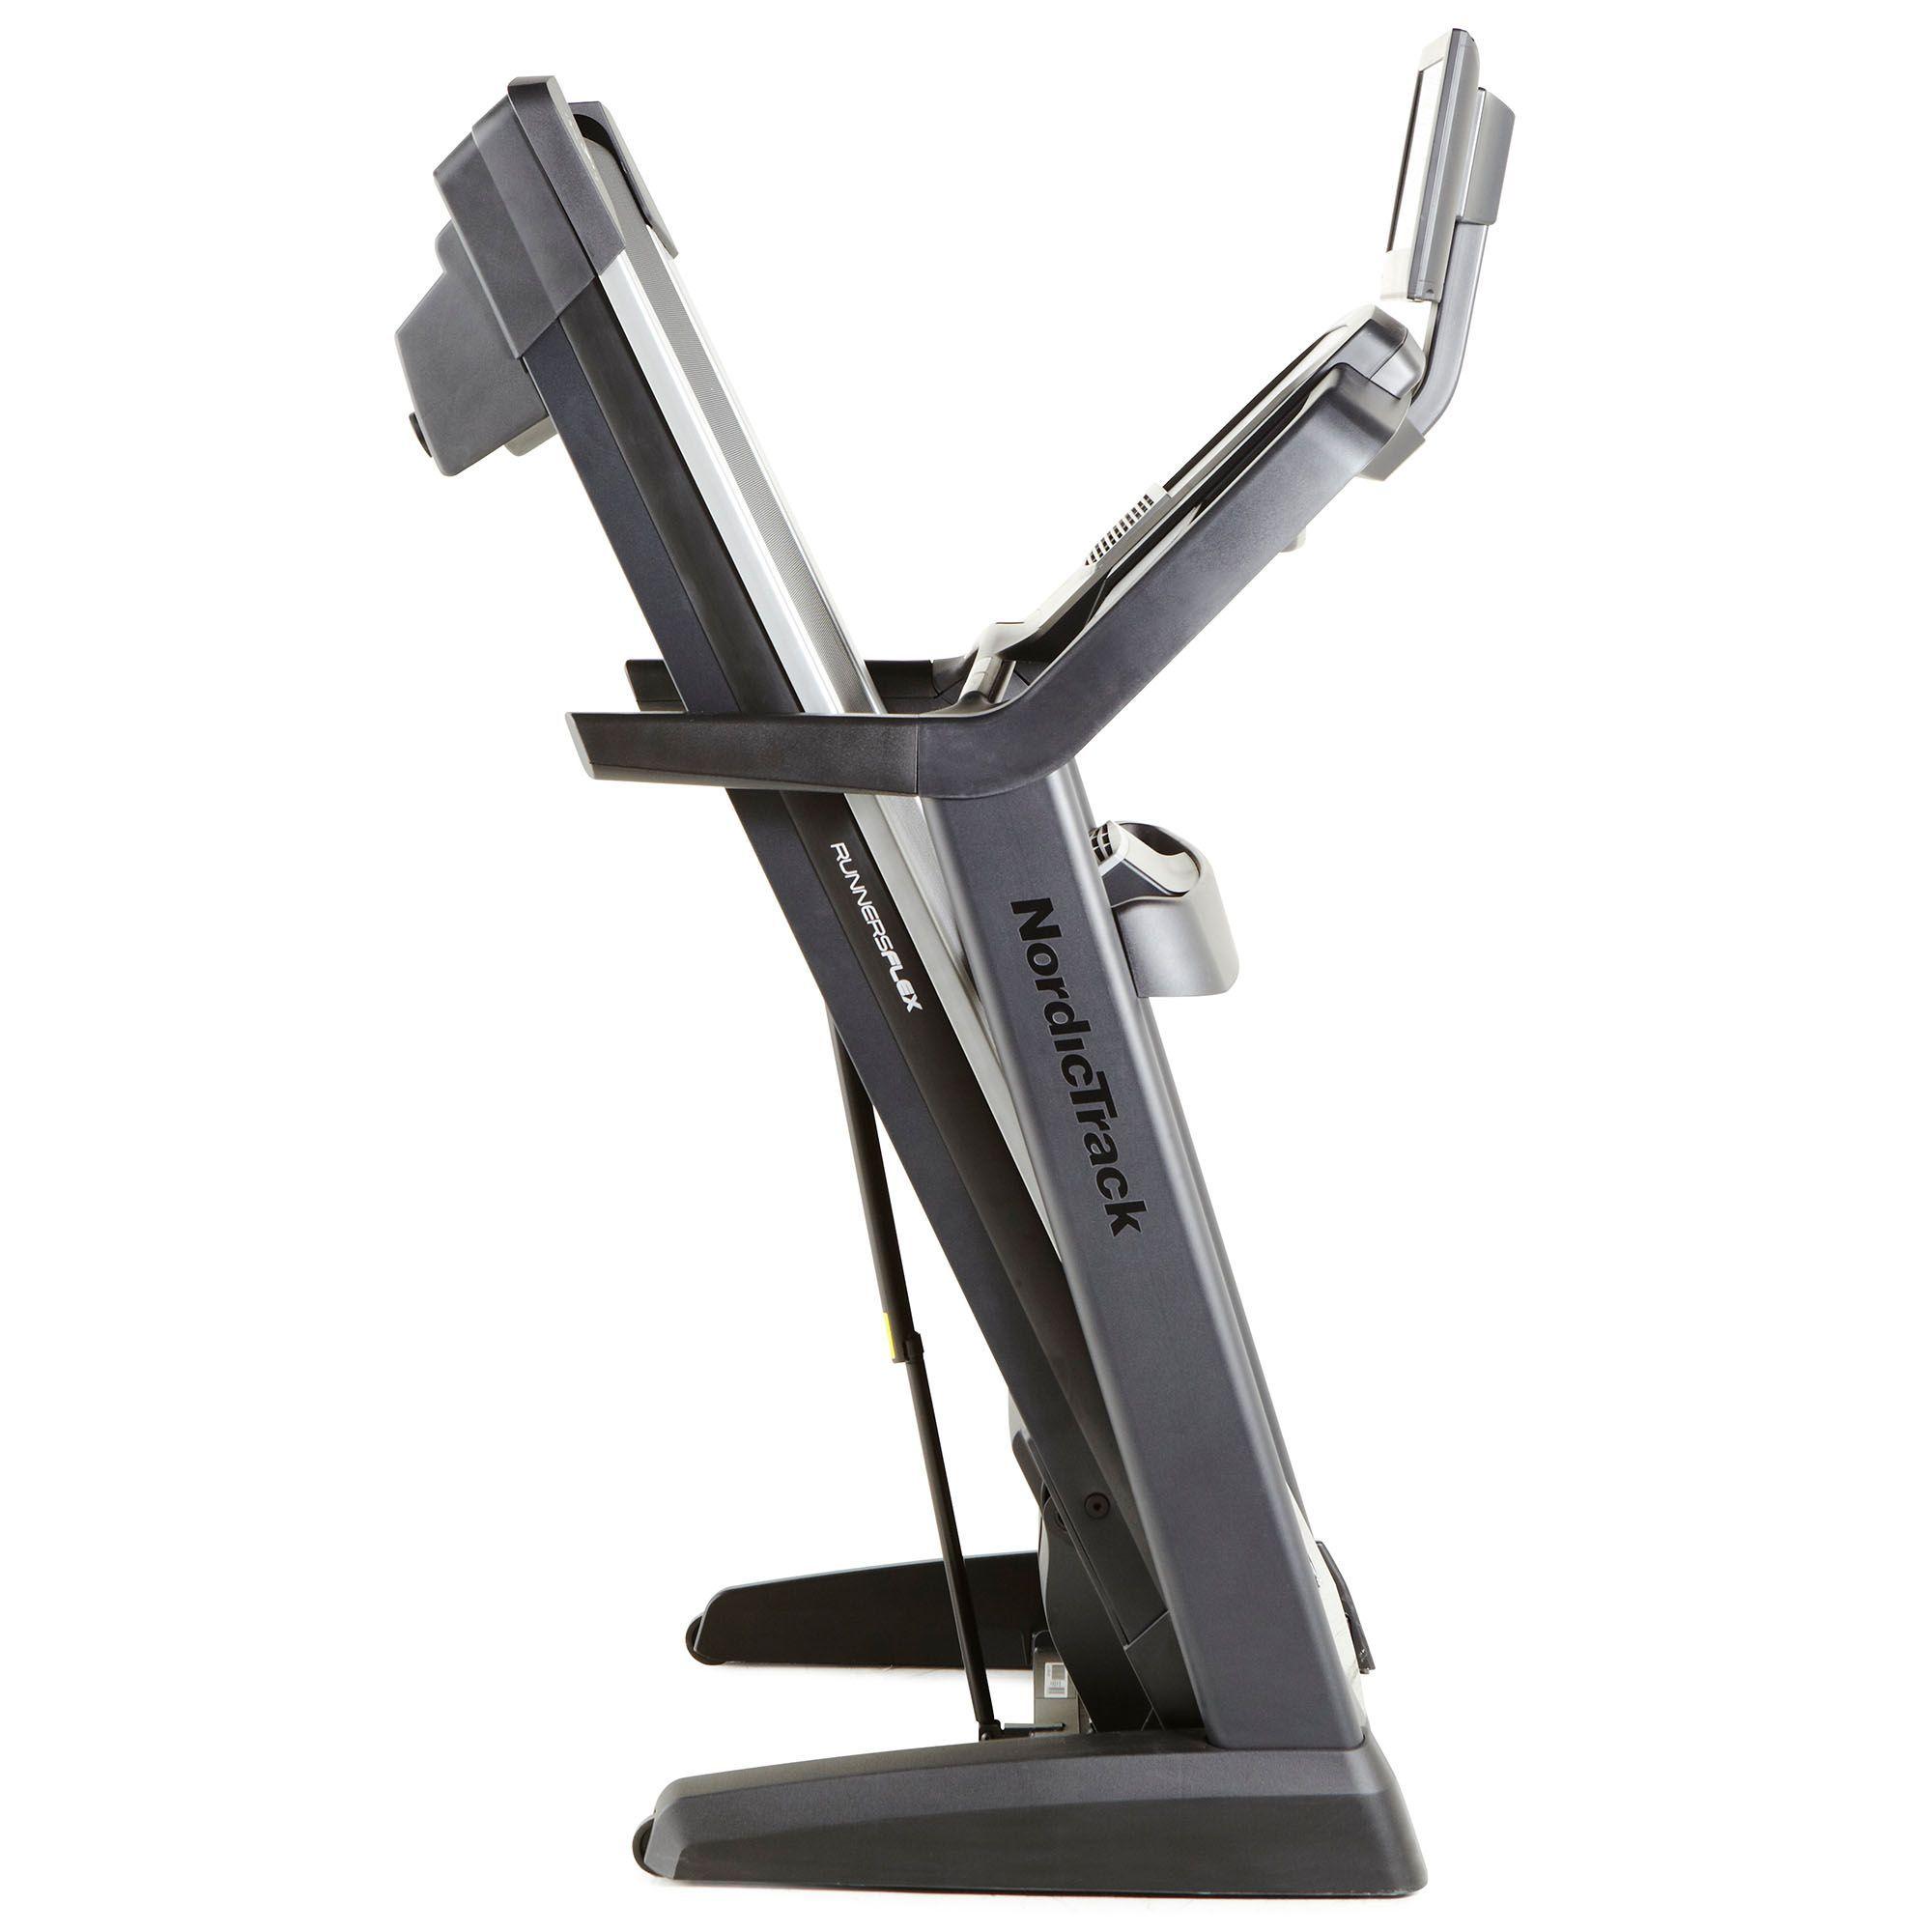 NordicTrack Premium Fitness Set